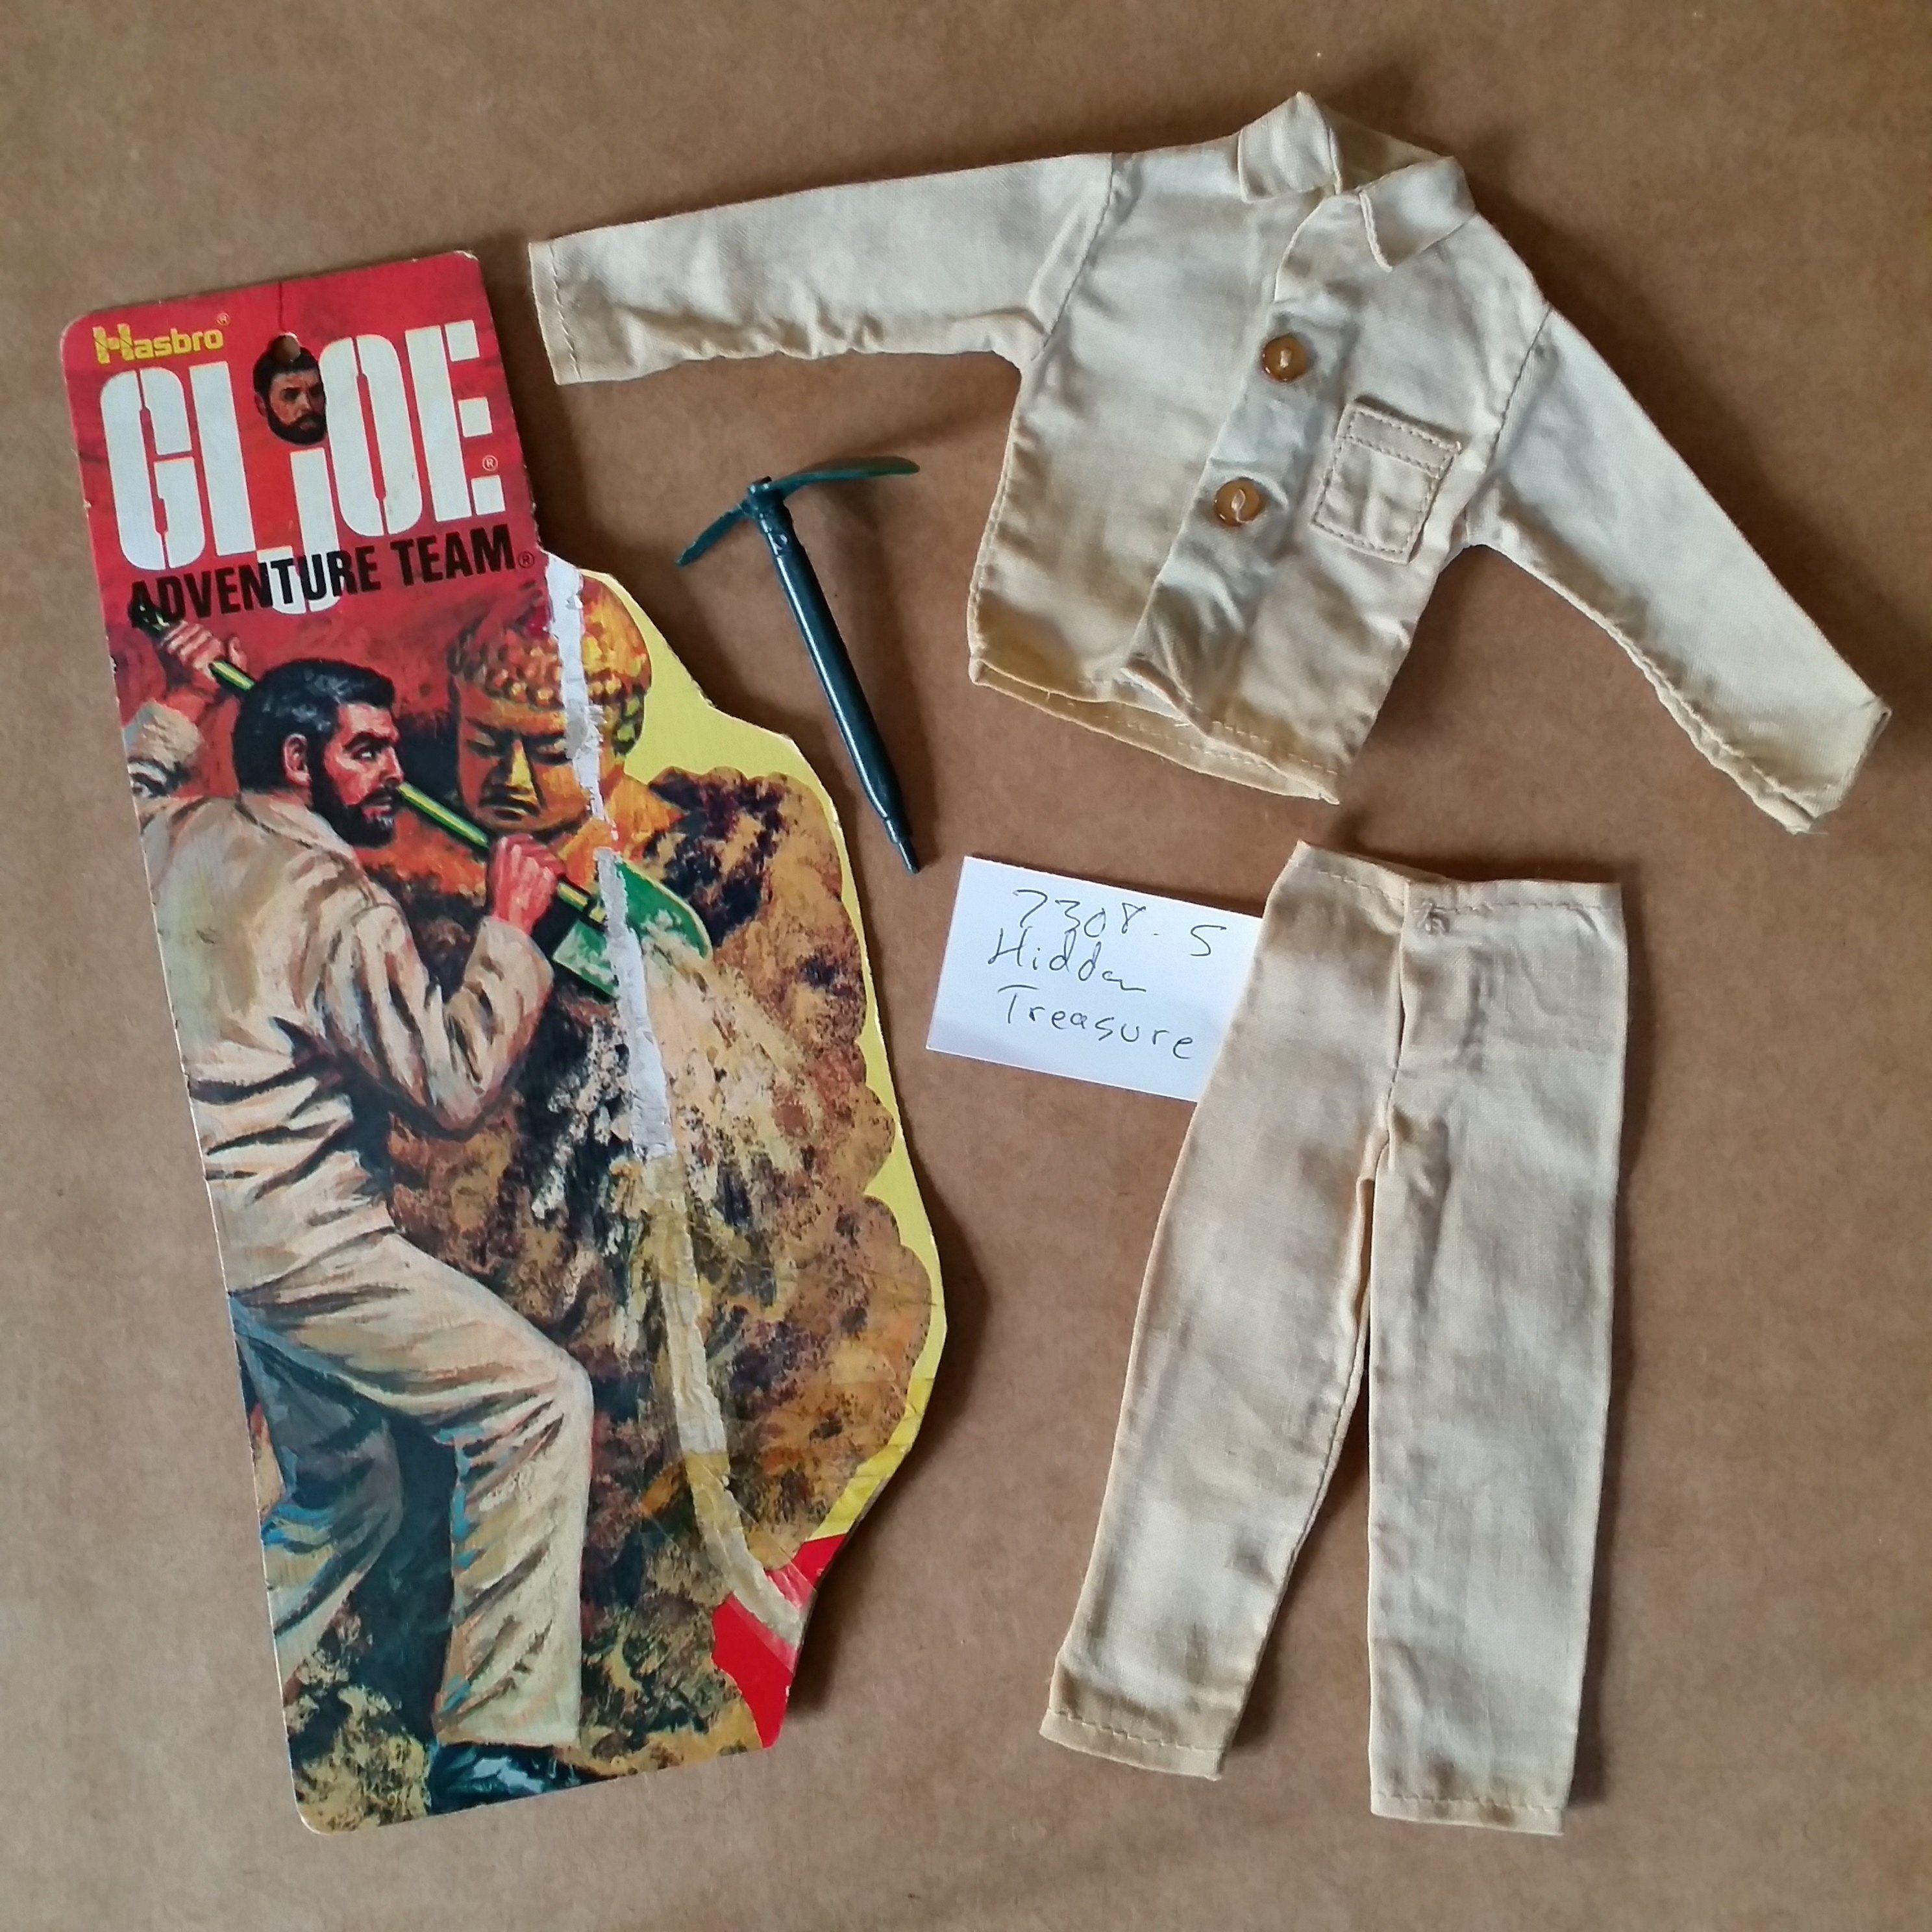 Gi Joe Adventure Team Action Outfit Hidden Treasure 7308 5 1974 By Hasbro Gi Joe Another Period Vintage Toys